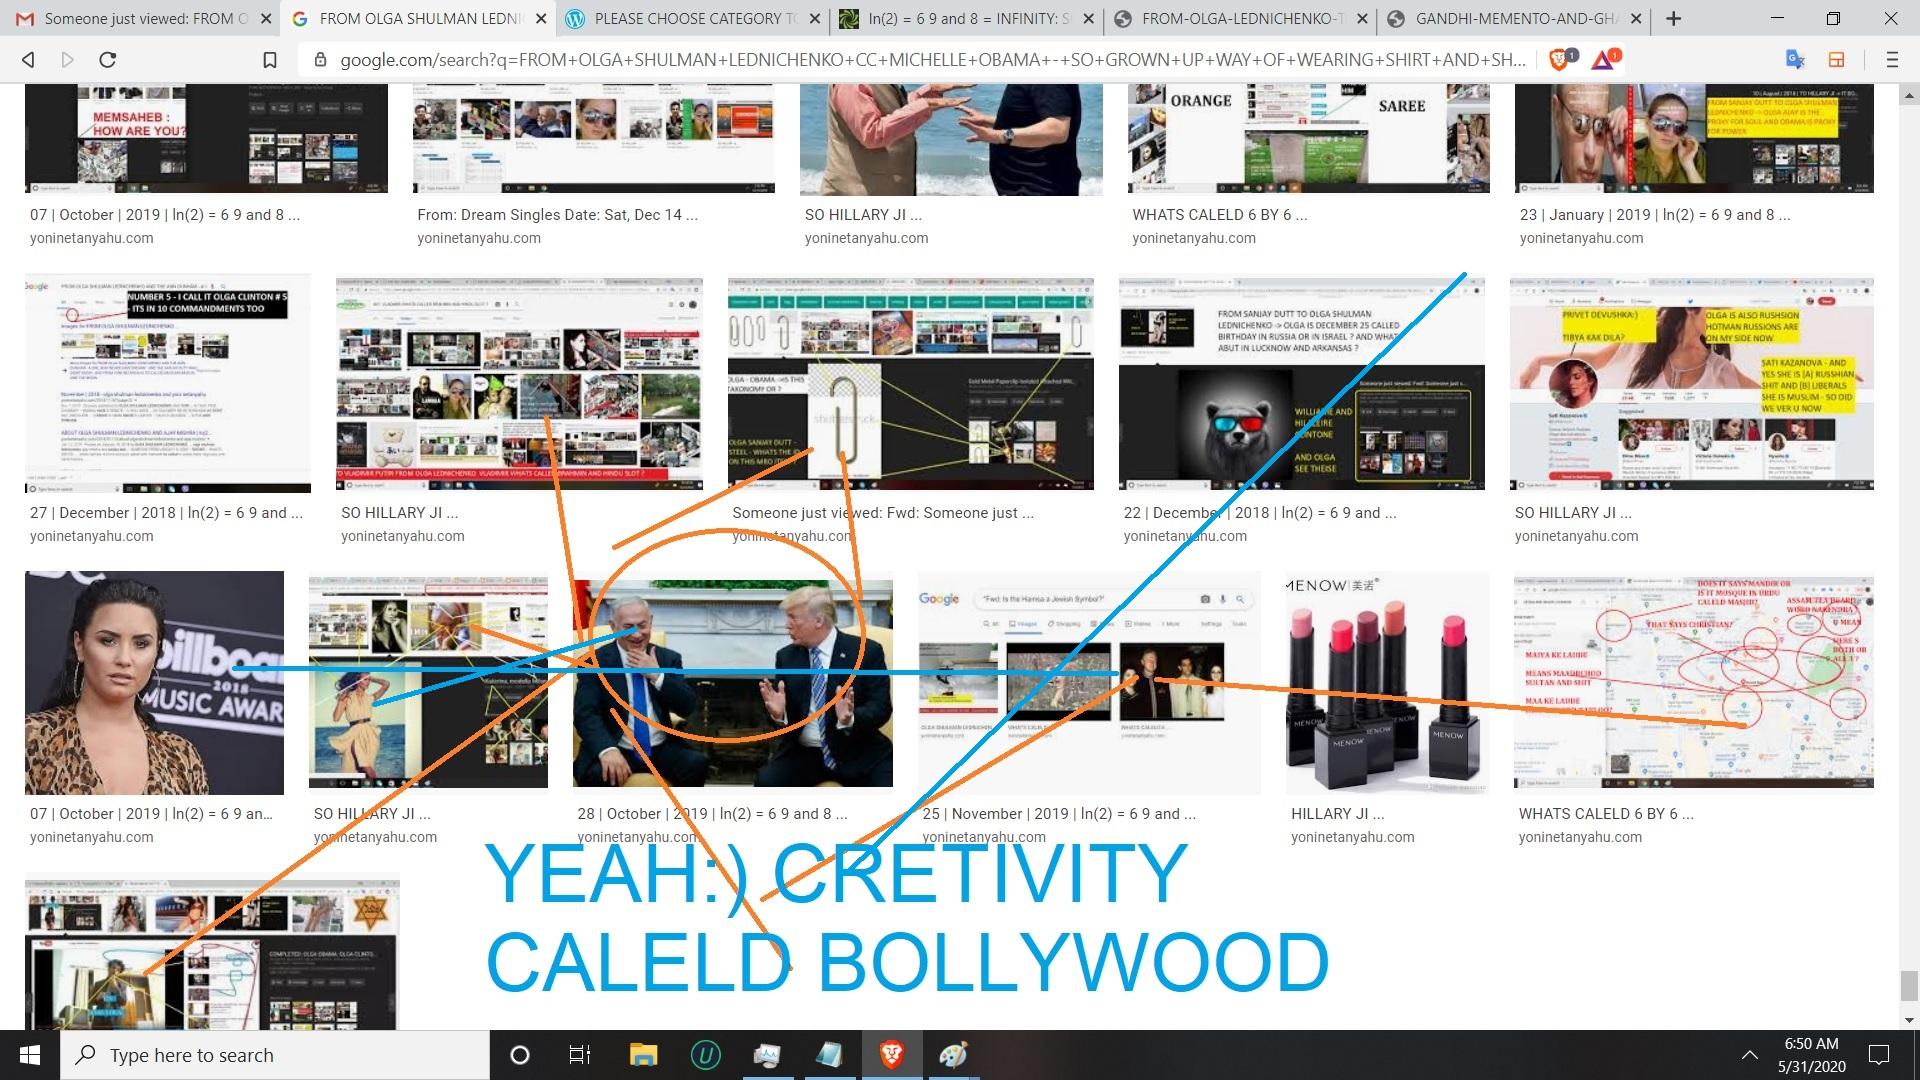 YEAH CREATIVITY CALED BOLLYWOOD